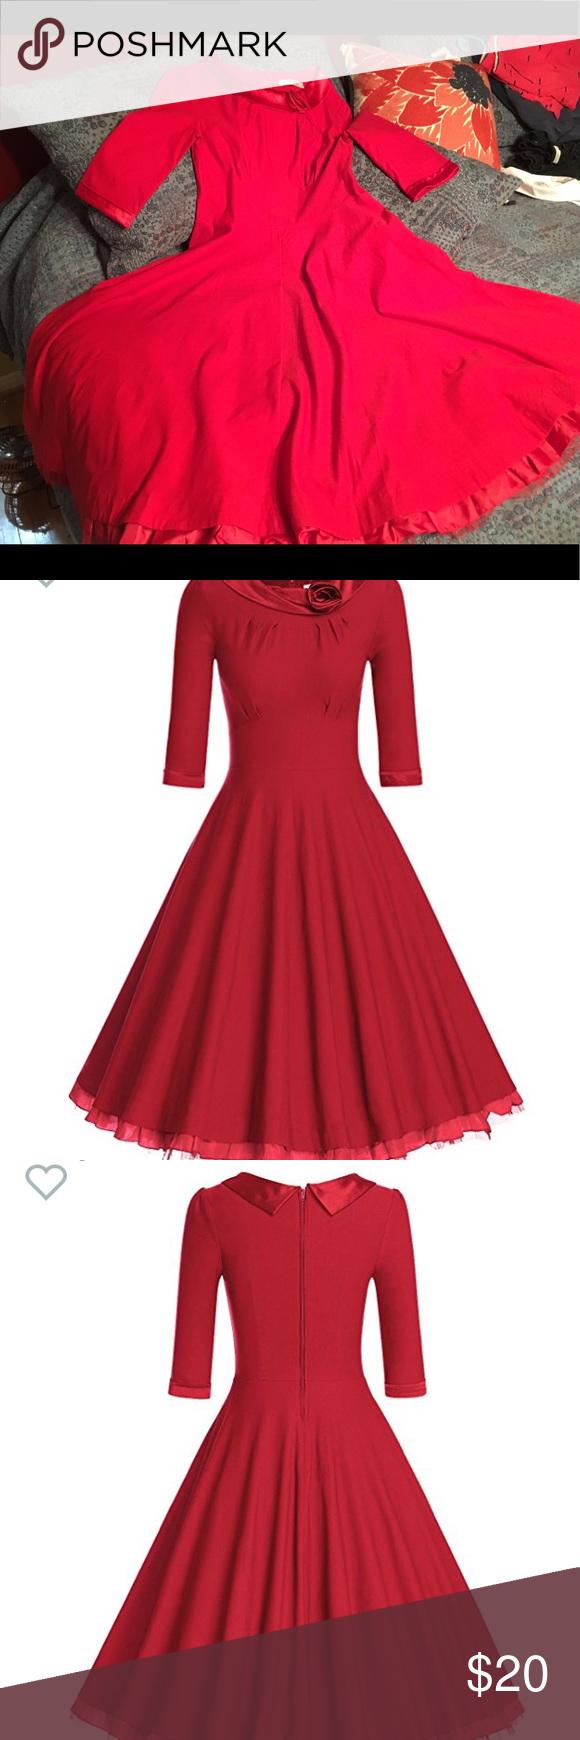 Womenus vintage sleeve rockabilly swing dress my posh picks